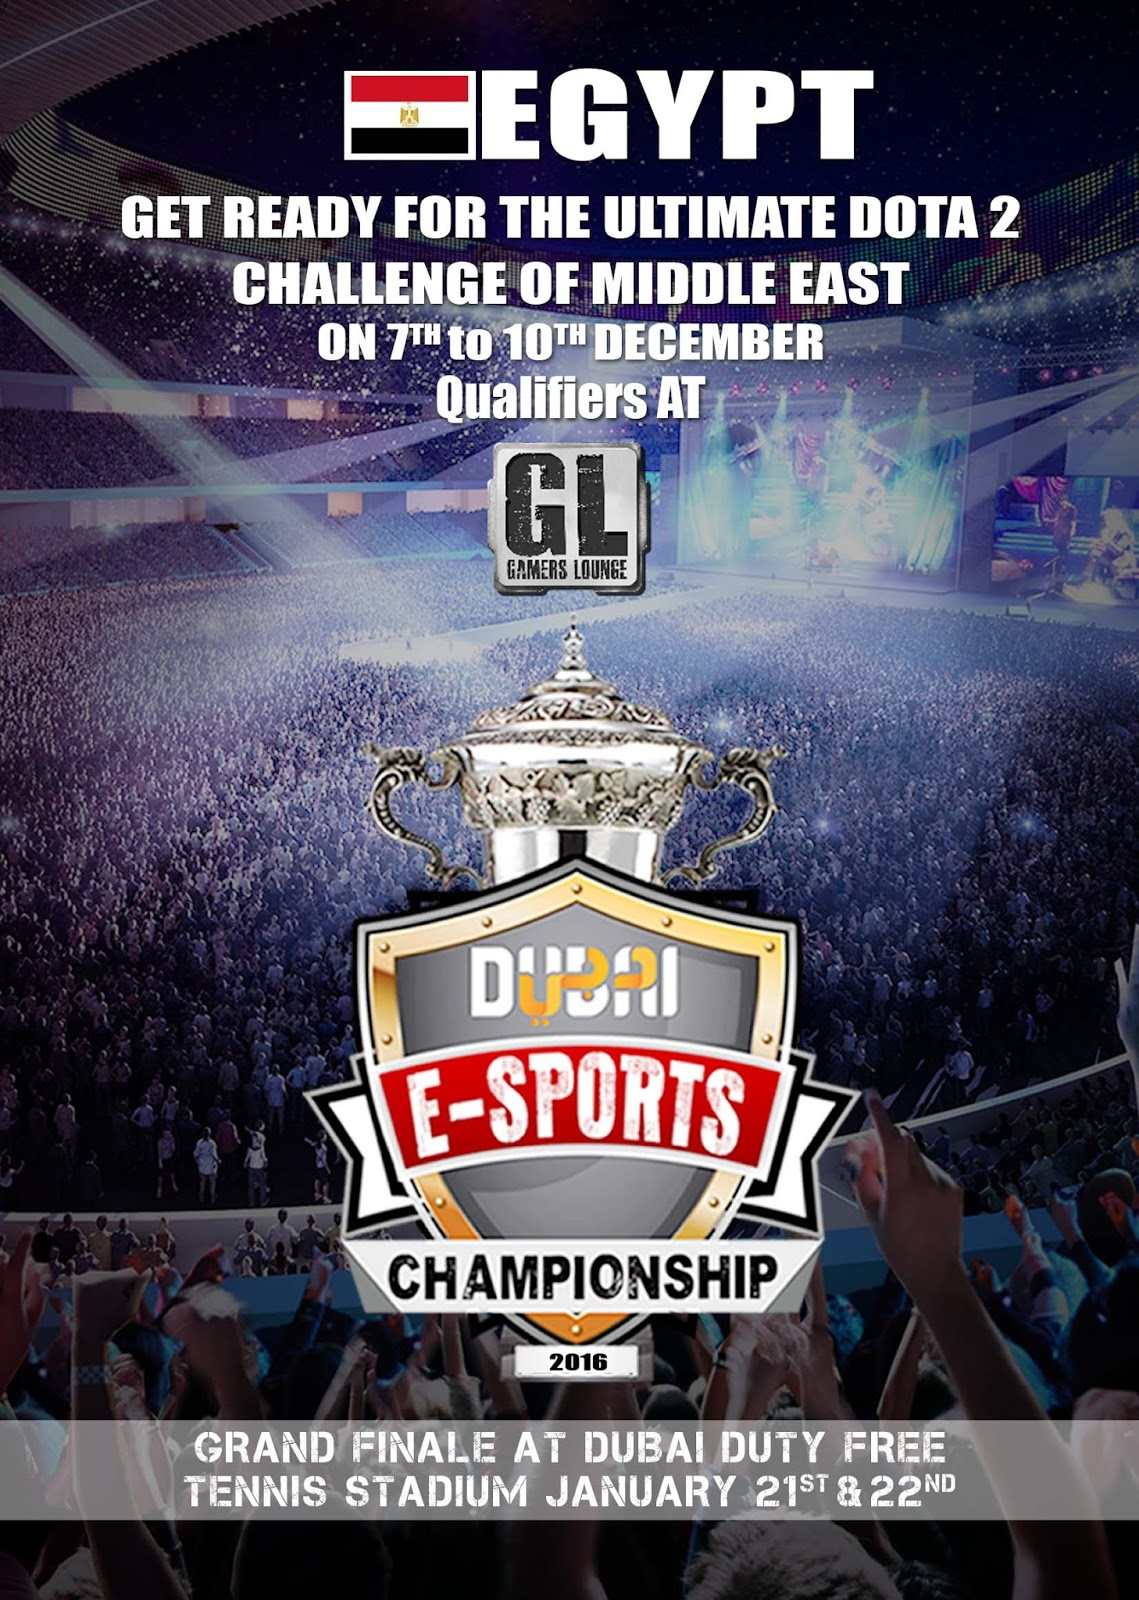 Dubai E Sports Championship For DOTA2 Dubai E Sports